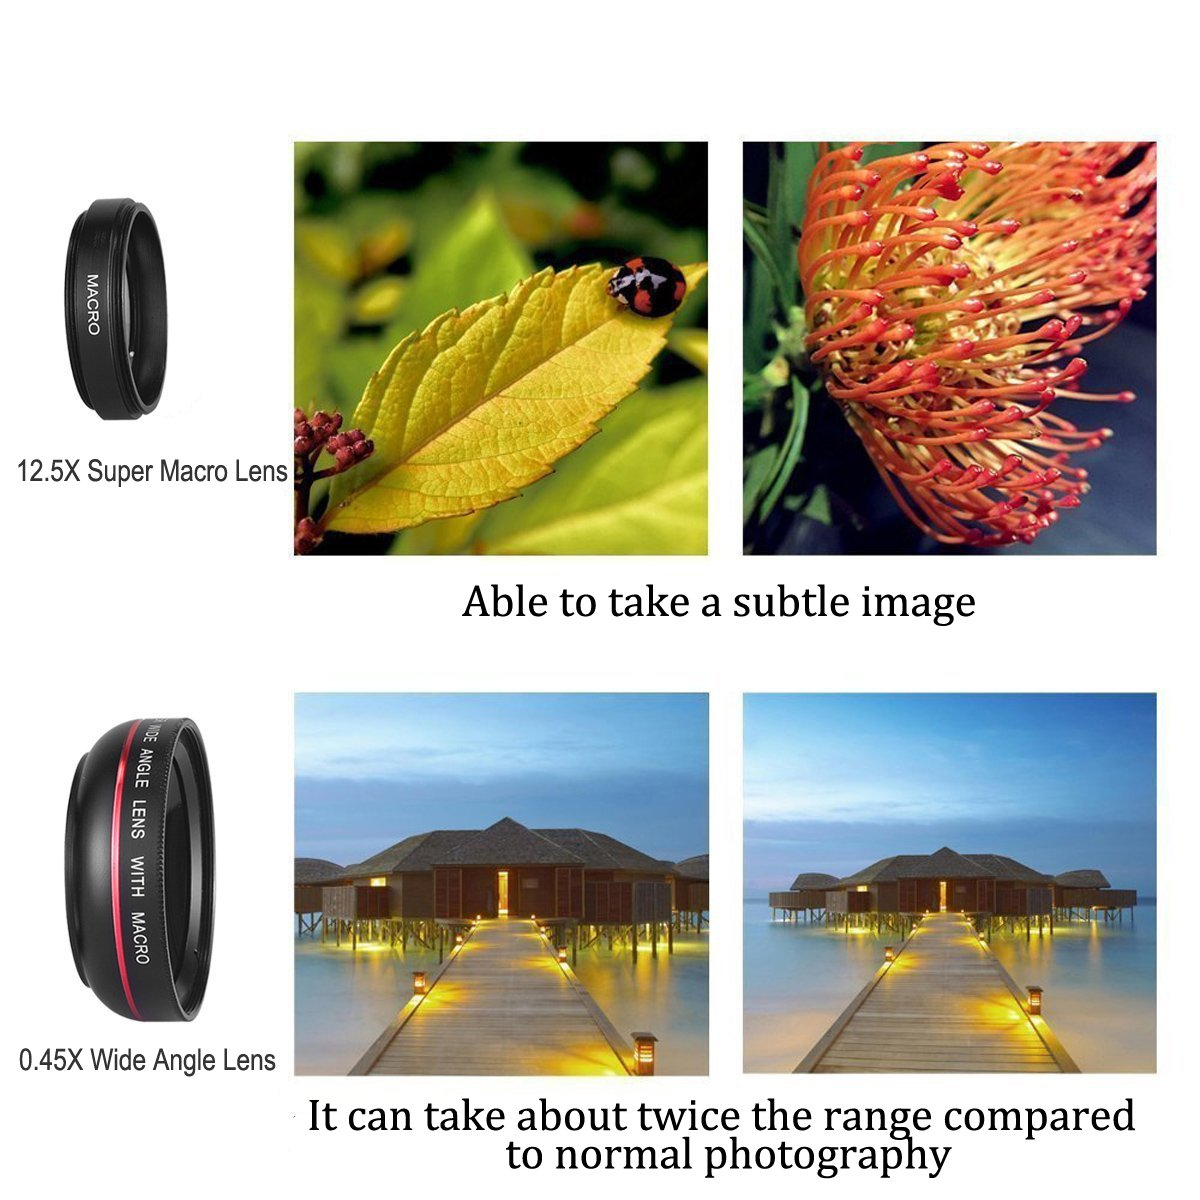 Mactrem Lentes de Movíl Ángulo Amplio Ojo de Pez de 3 en 1 Clip-On con lente angular/ojo de pez para iPhone6/6s 12.5X Super Macro Lens + 0.45X Wide Angle Lens para iPhone 7 / 7 Plus / 6 / 6 Plus / 5S / 5, Samsung Galaxy S6 / S6 Edge / S5, e